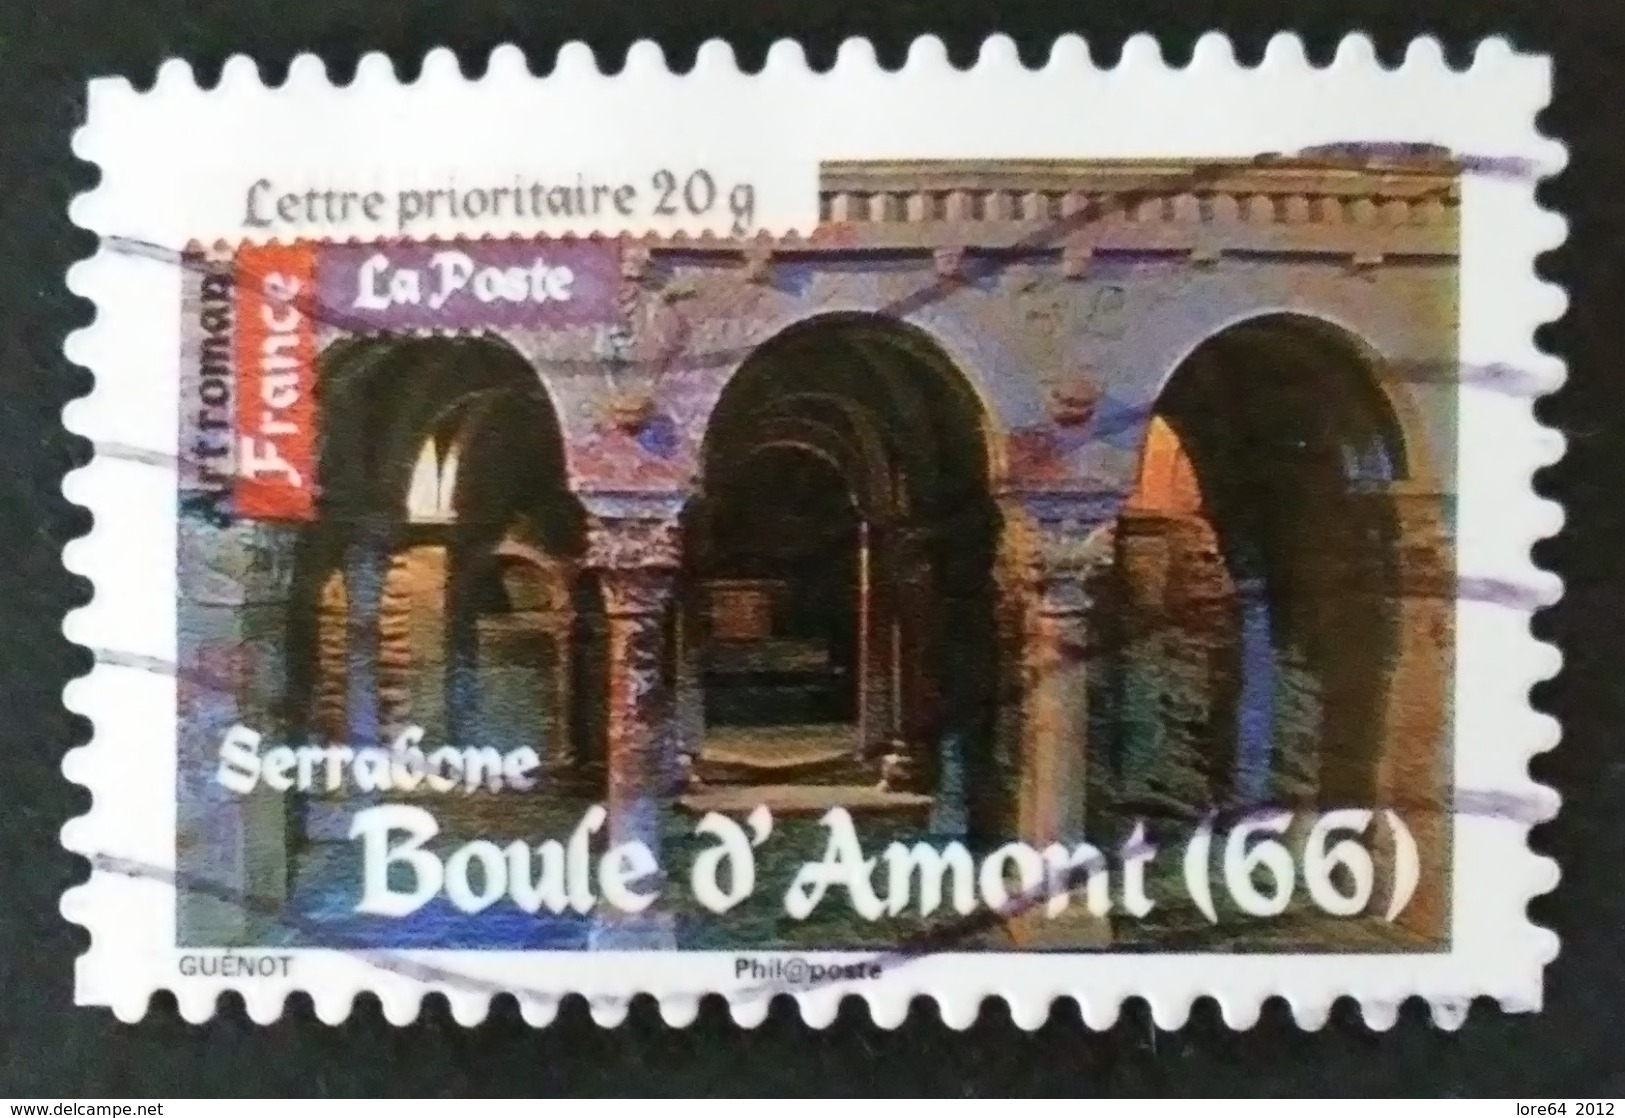 FRANCIA 2010 - 458 - France